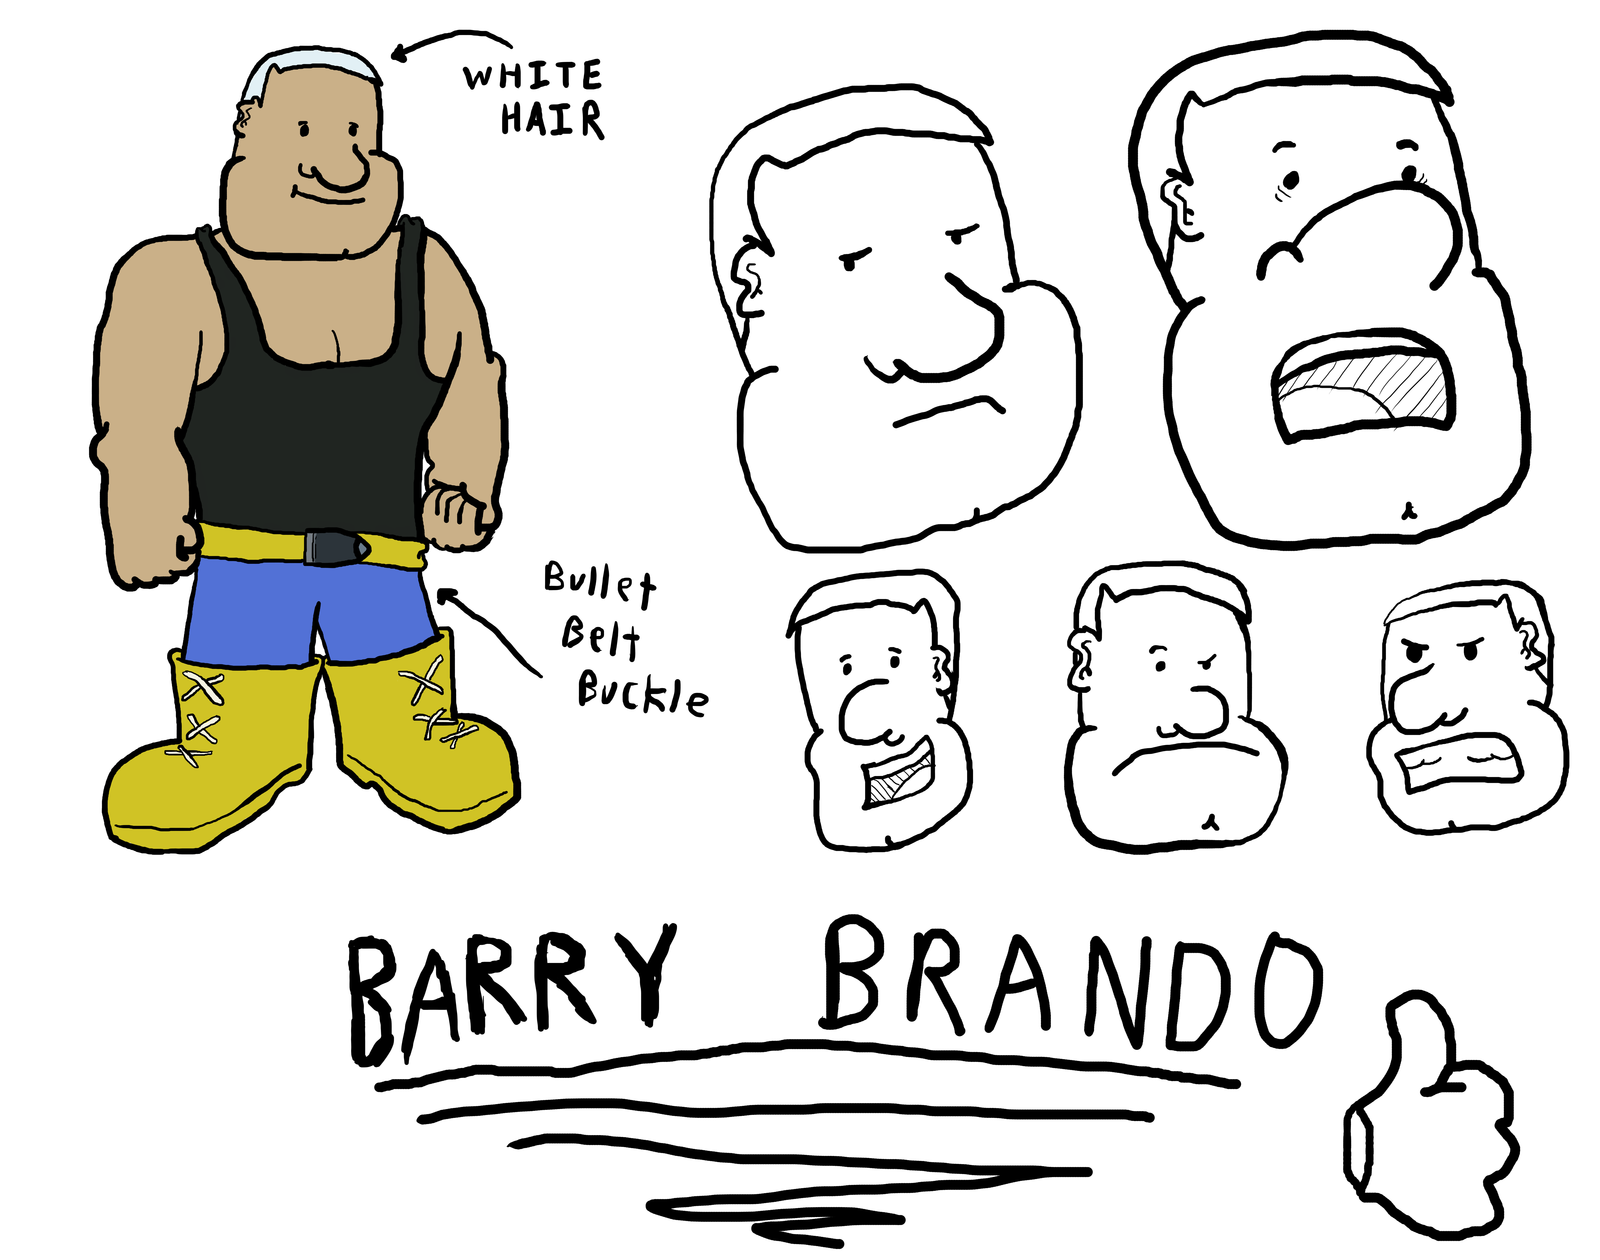 Barry Brando - character sheet